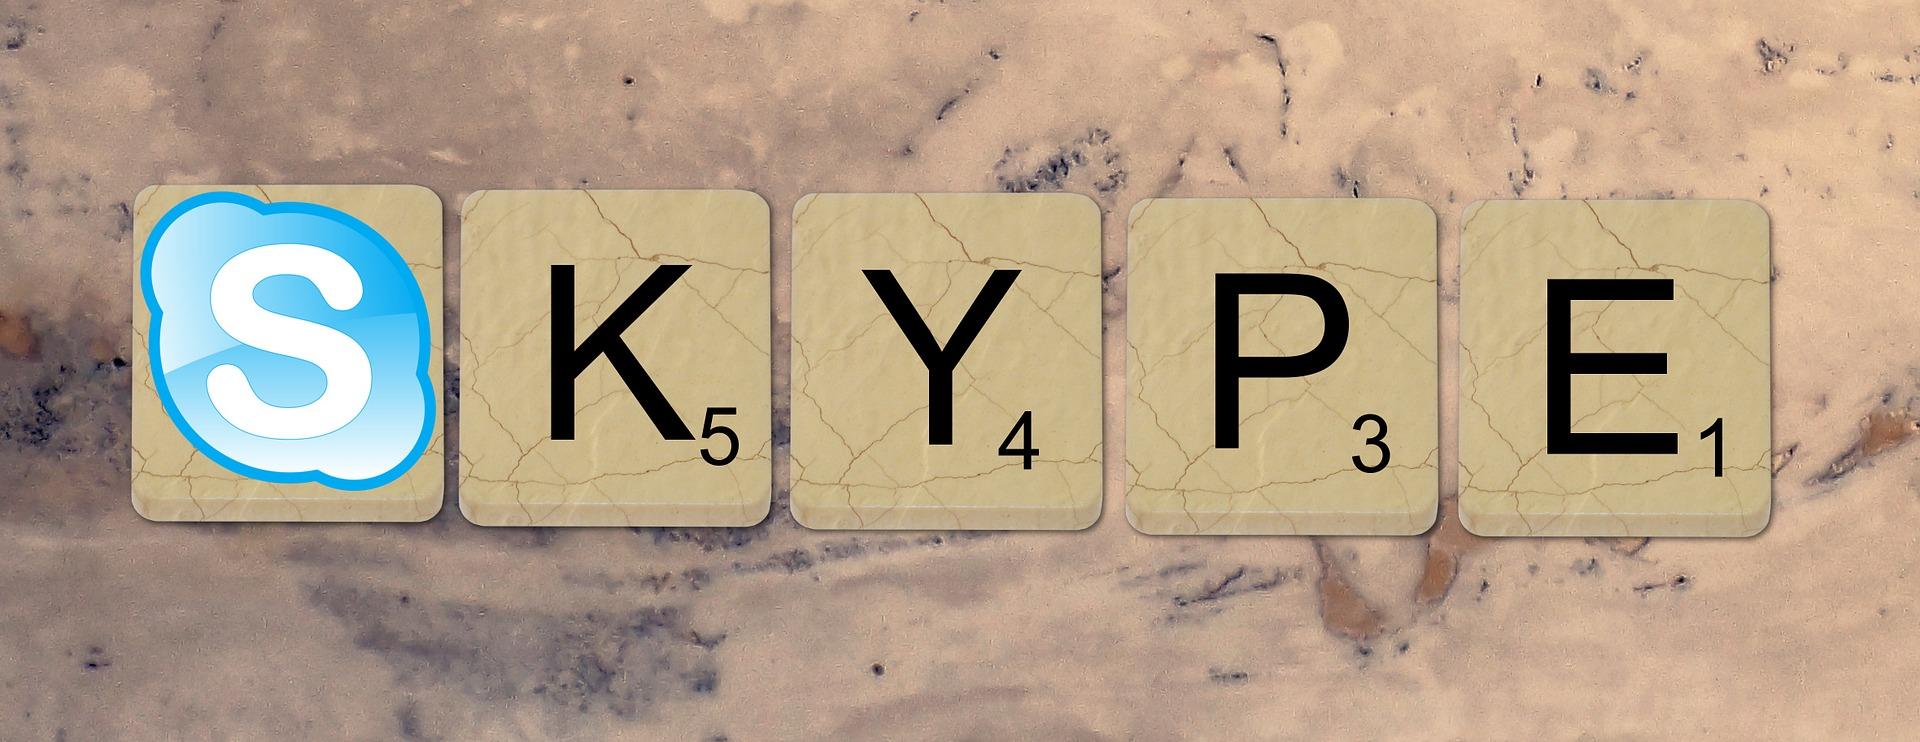 skype-1007073_1920jpg